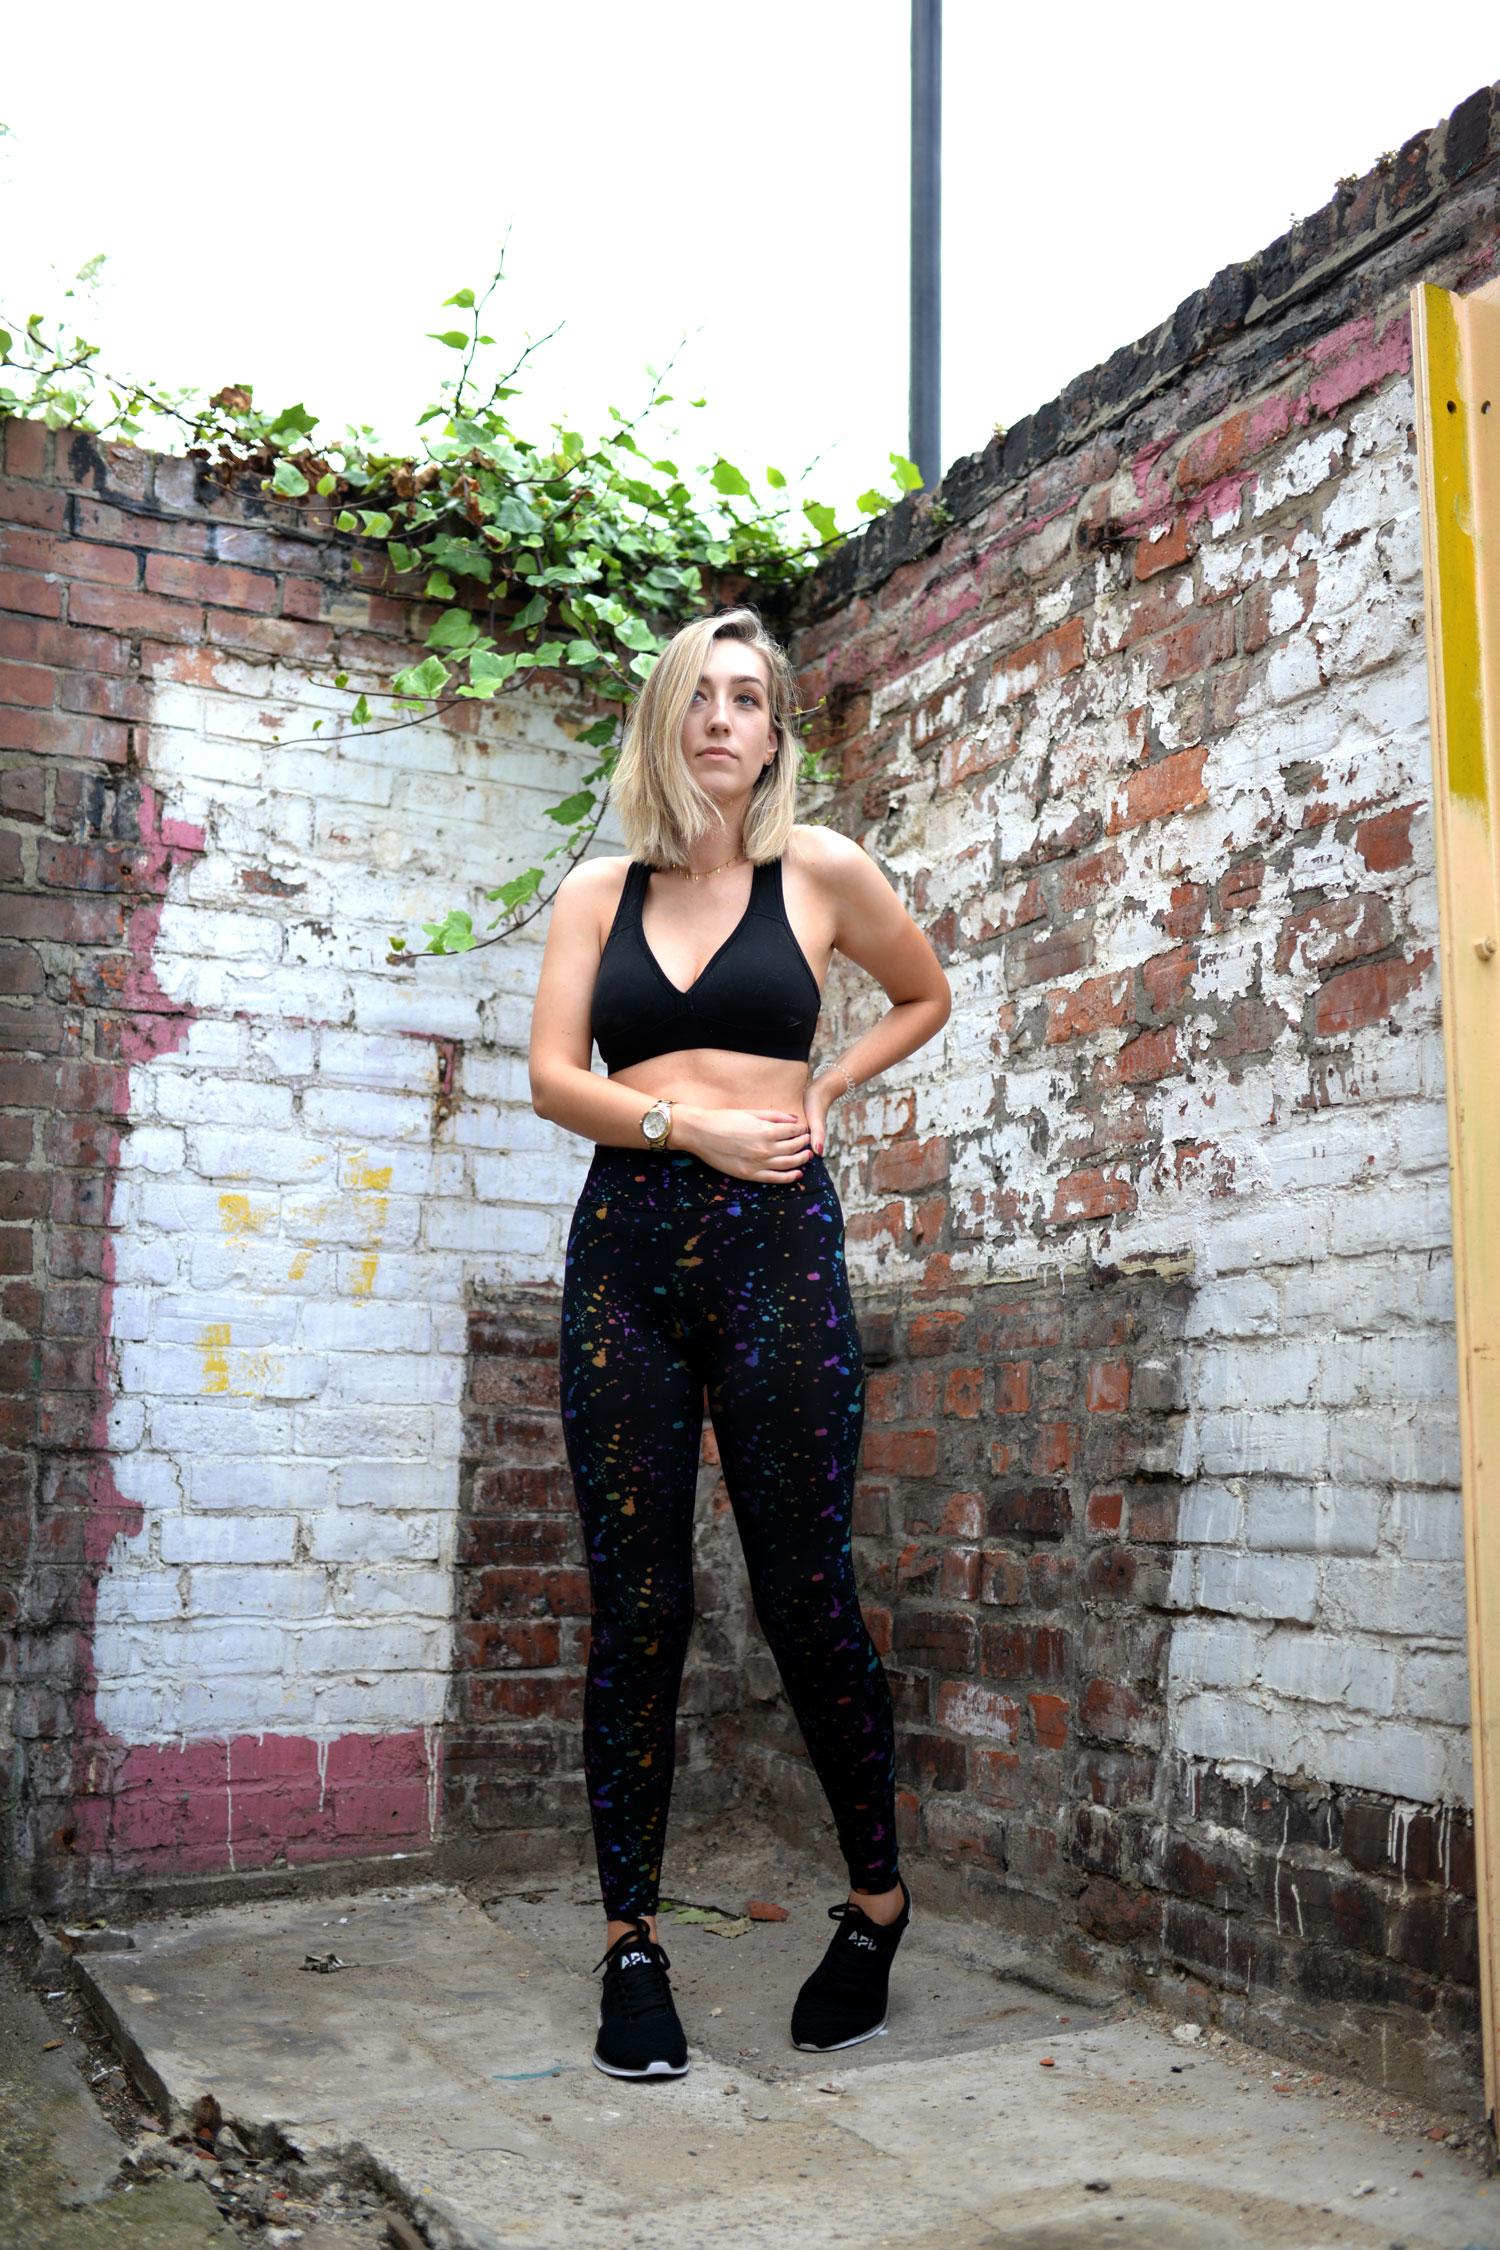 the-sports-edit-leggings-sports-bra-yoga-outfit